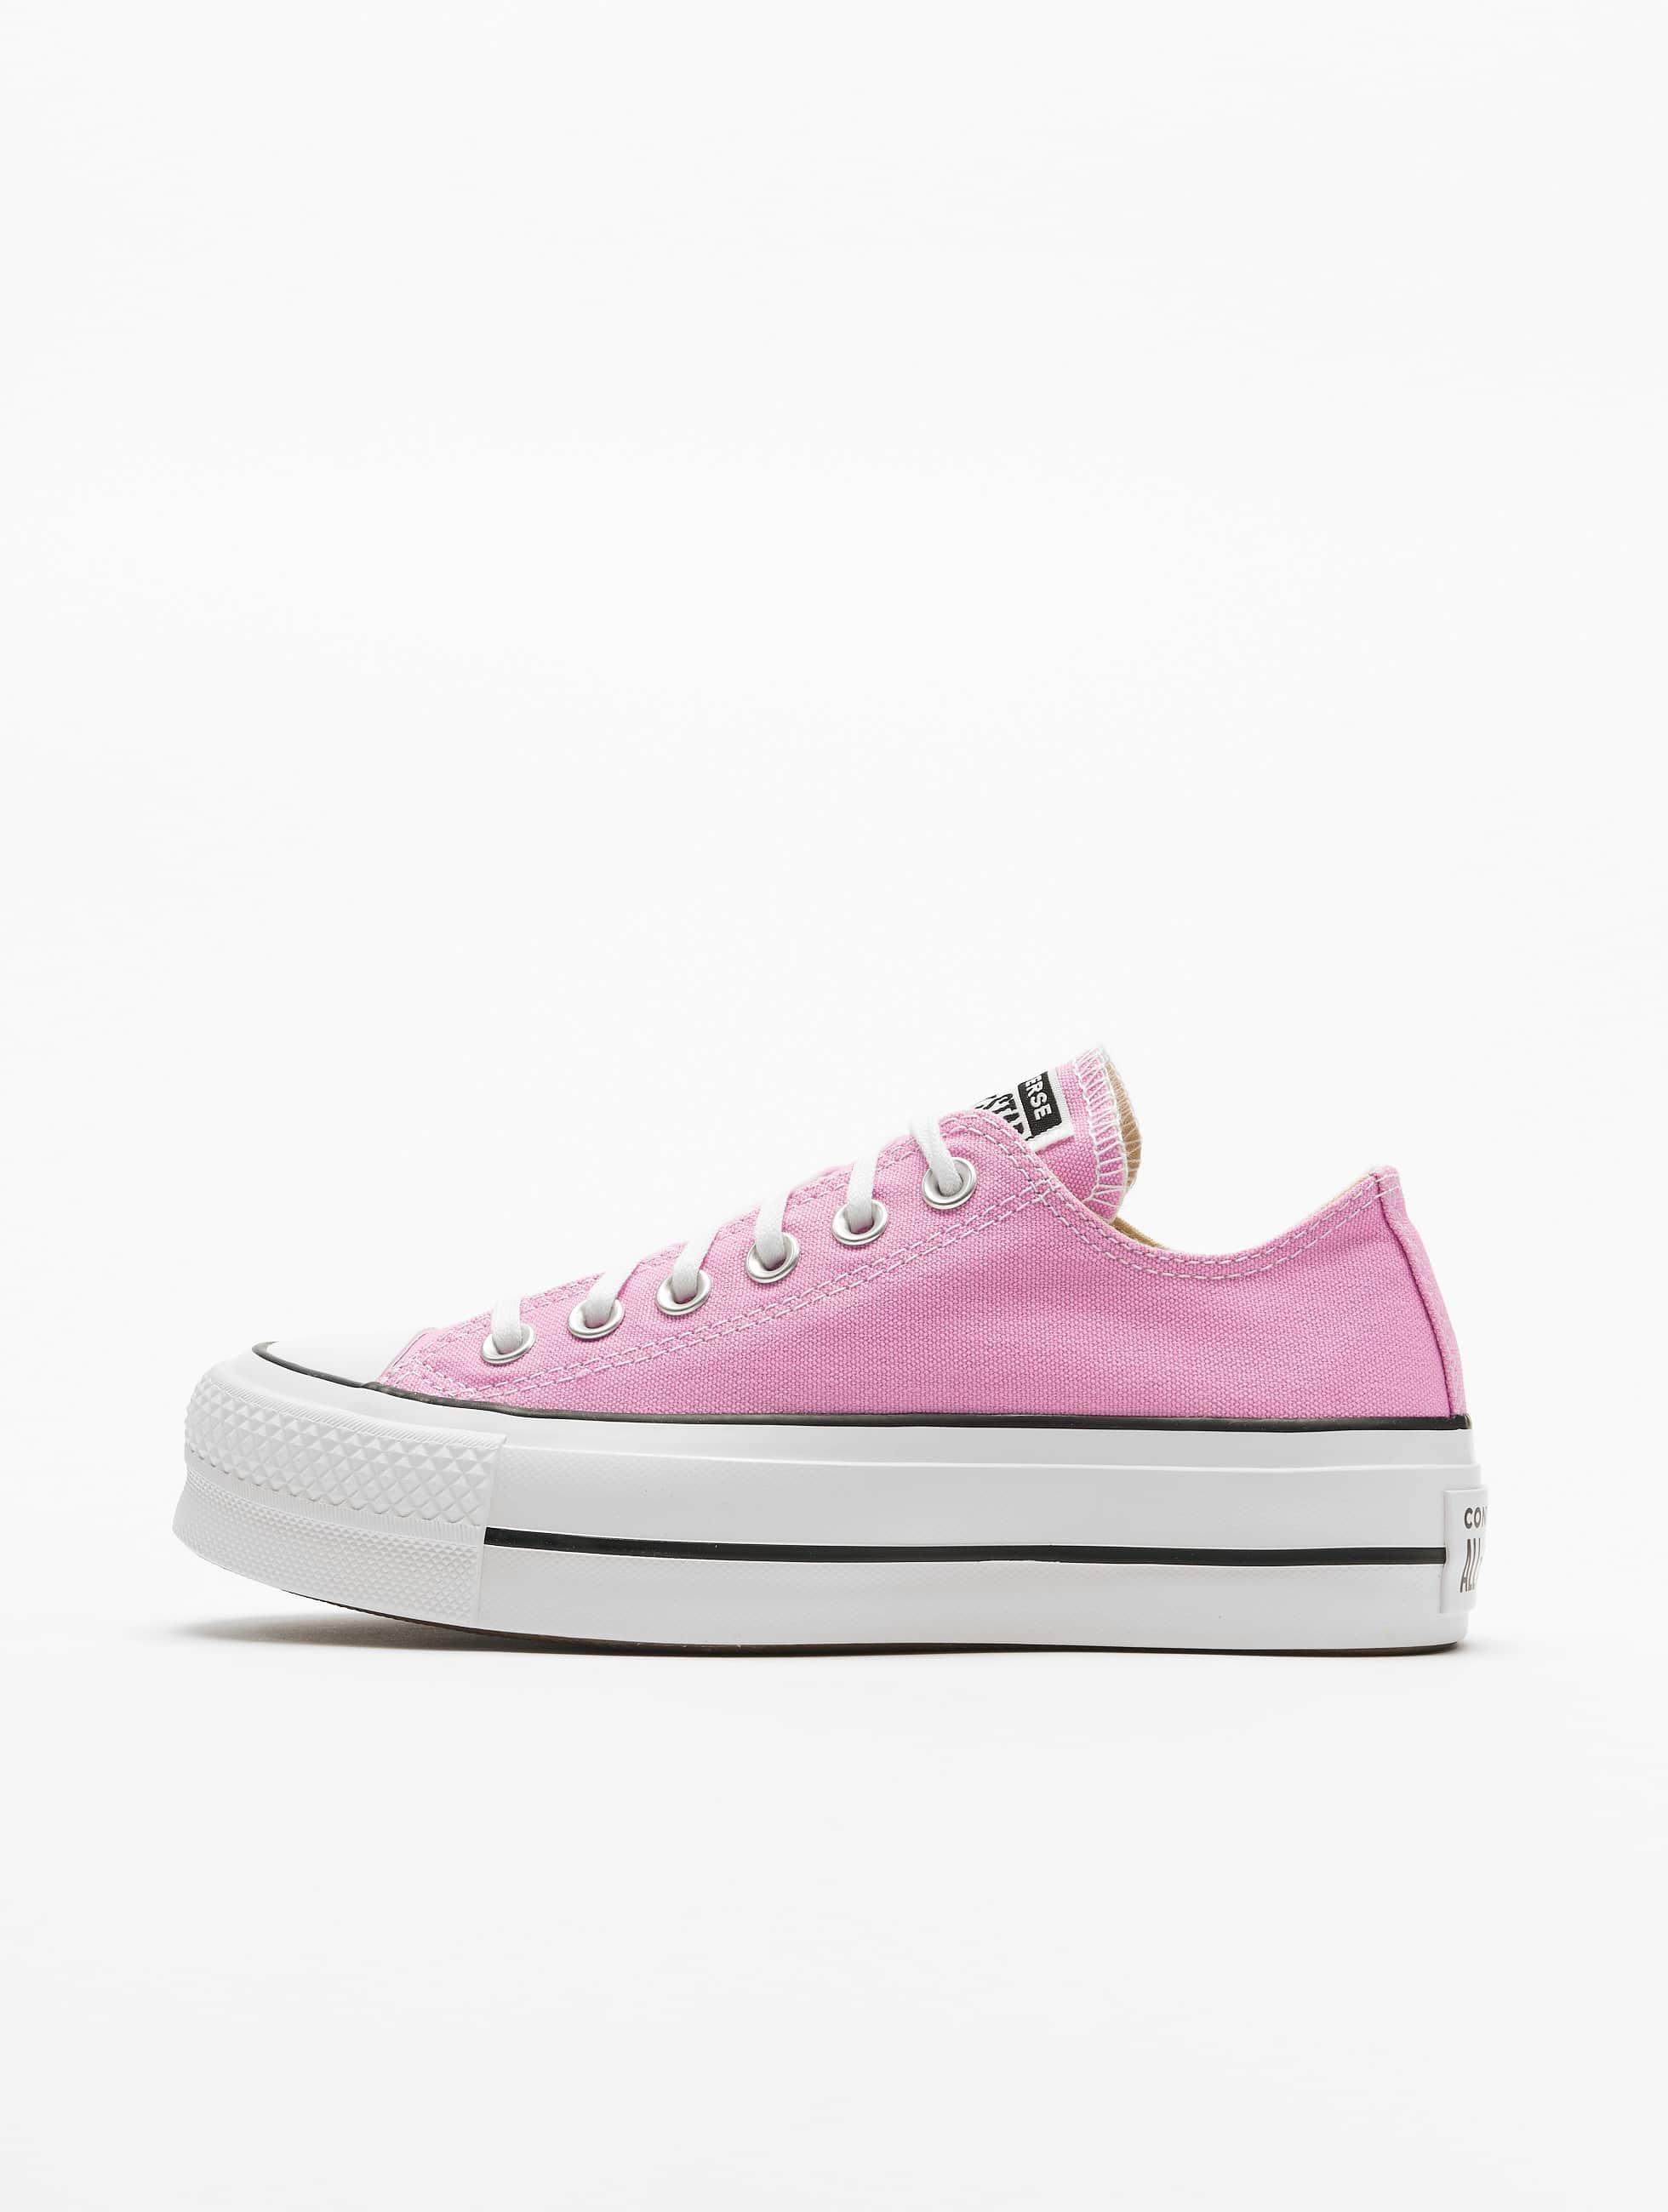 Converse Ctas Lift Ox Sneakers Peony PinkWhiteBlack